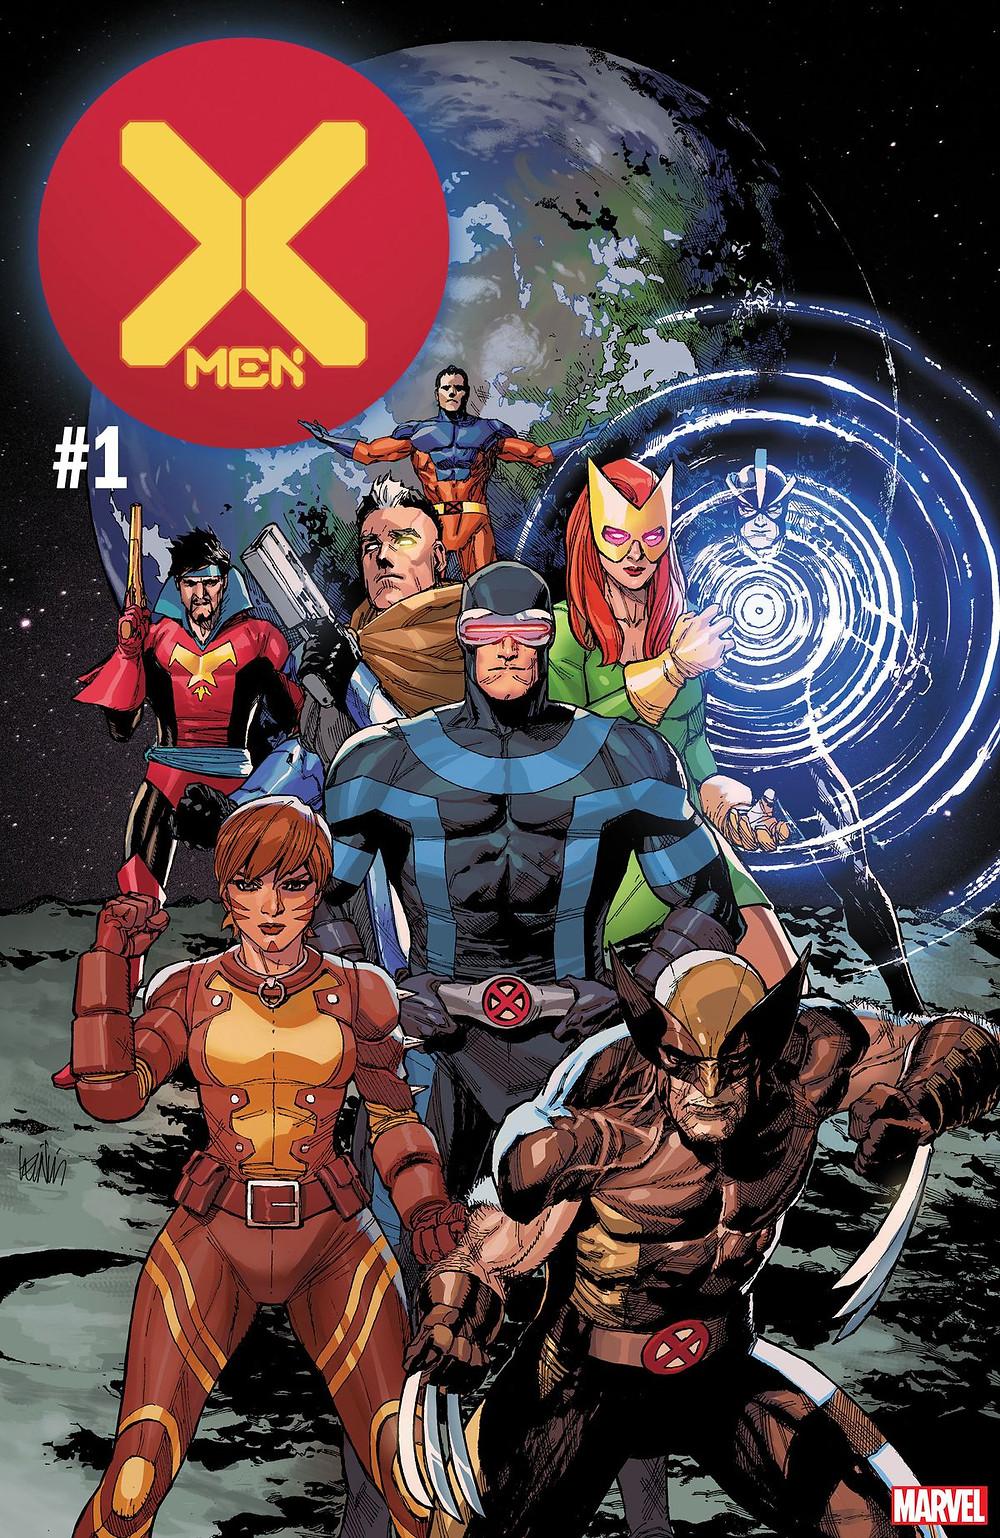 X-Men #1, cover, Marvel Comics, Leinil Francis Yu